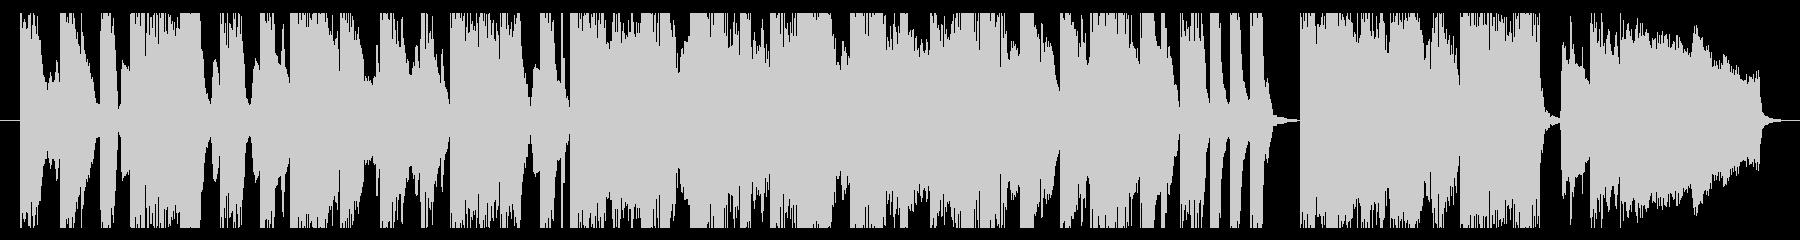 CM 30秒サイズ 軽やかな気分での未再生の波形